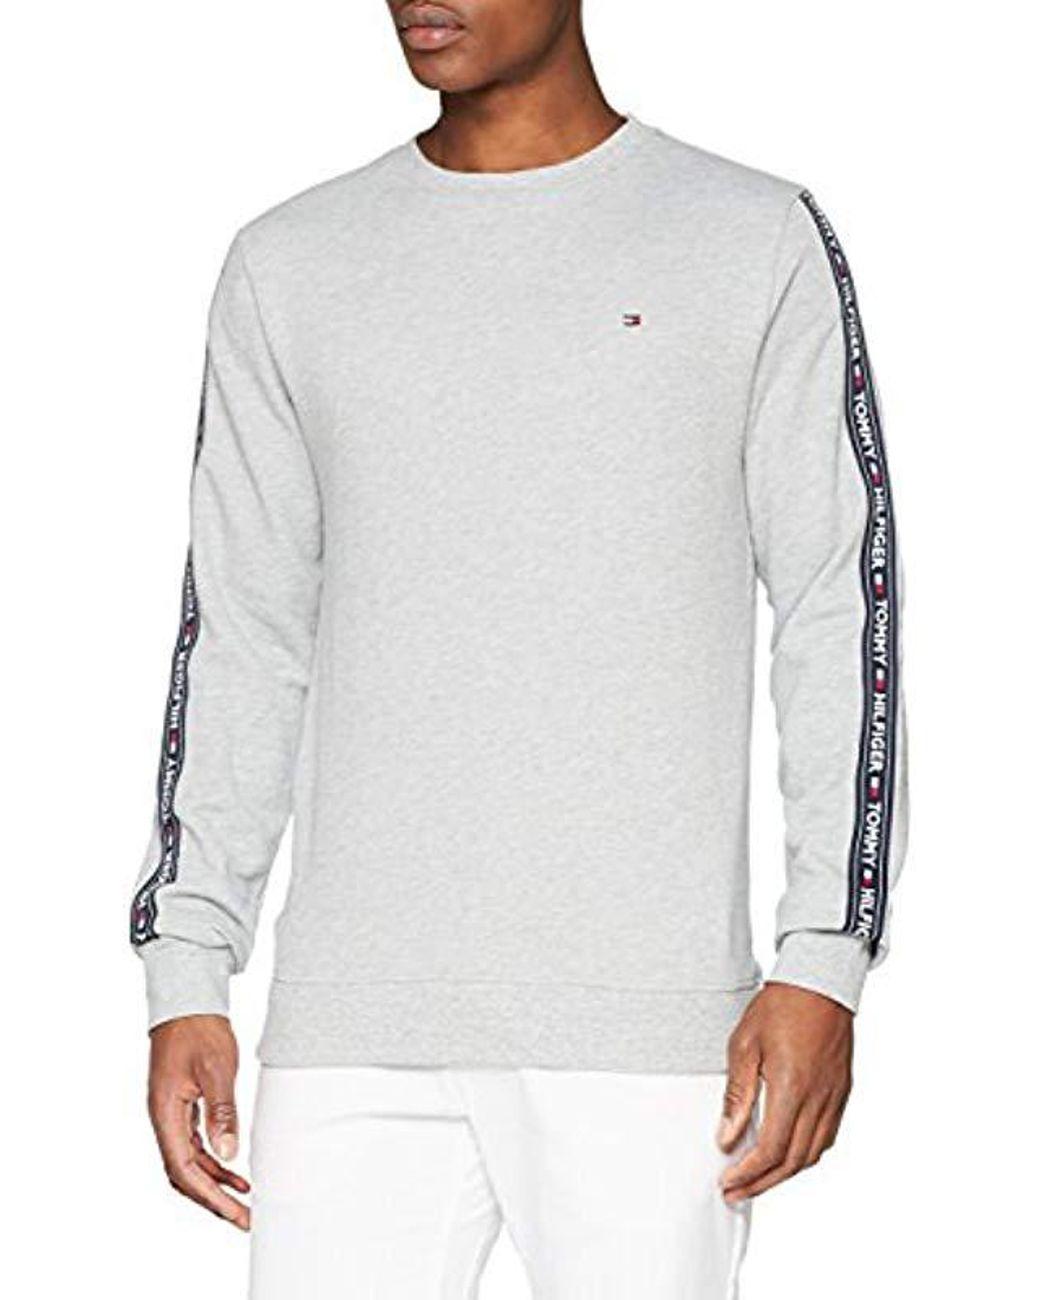 d263e3b15 Tommy Hilfiger Track Ls Hwk Sweater in Gray for Men - Lyst